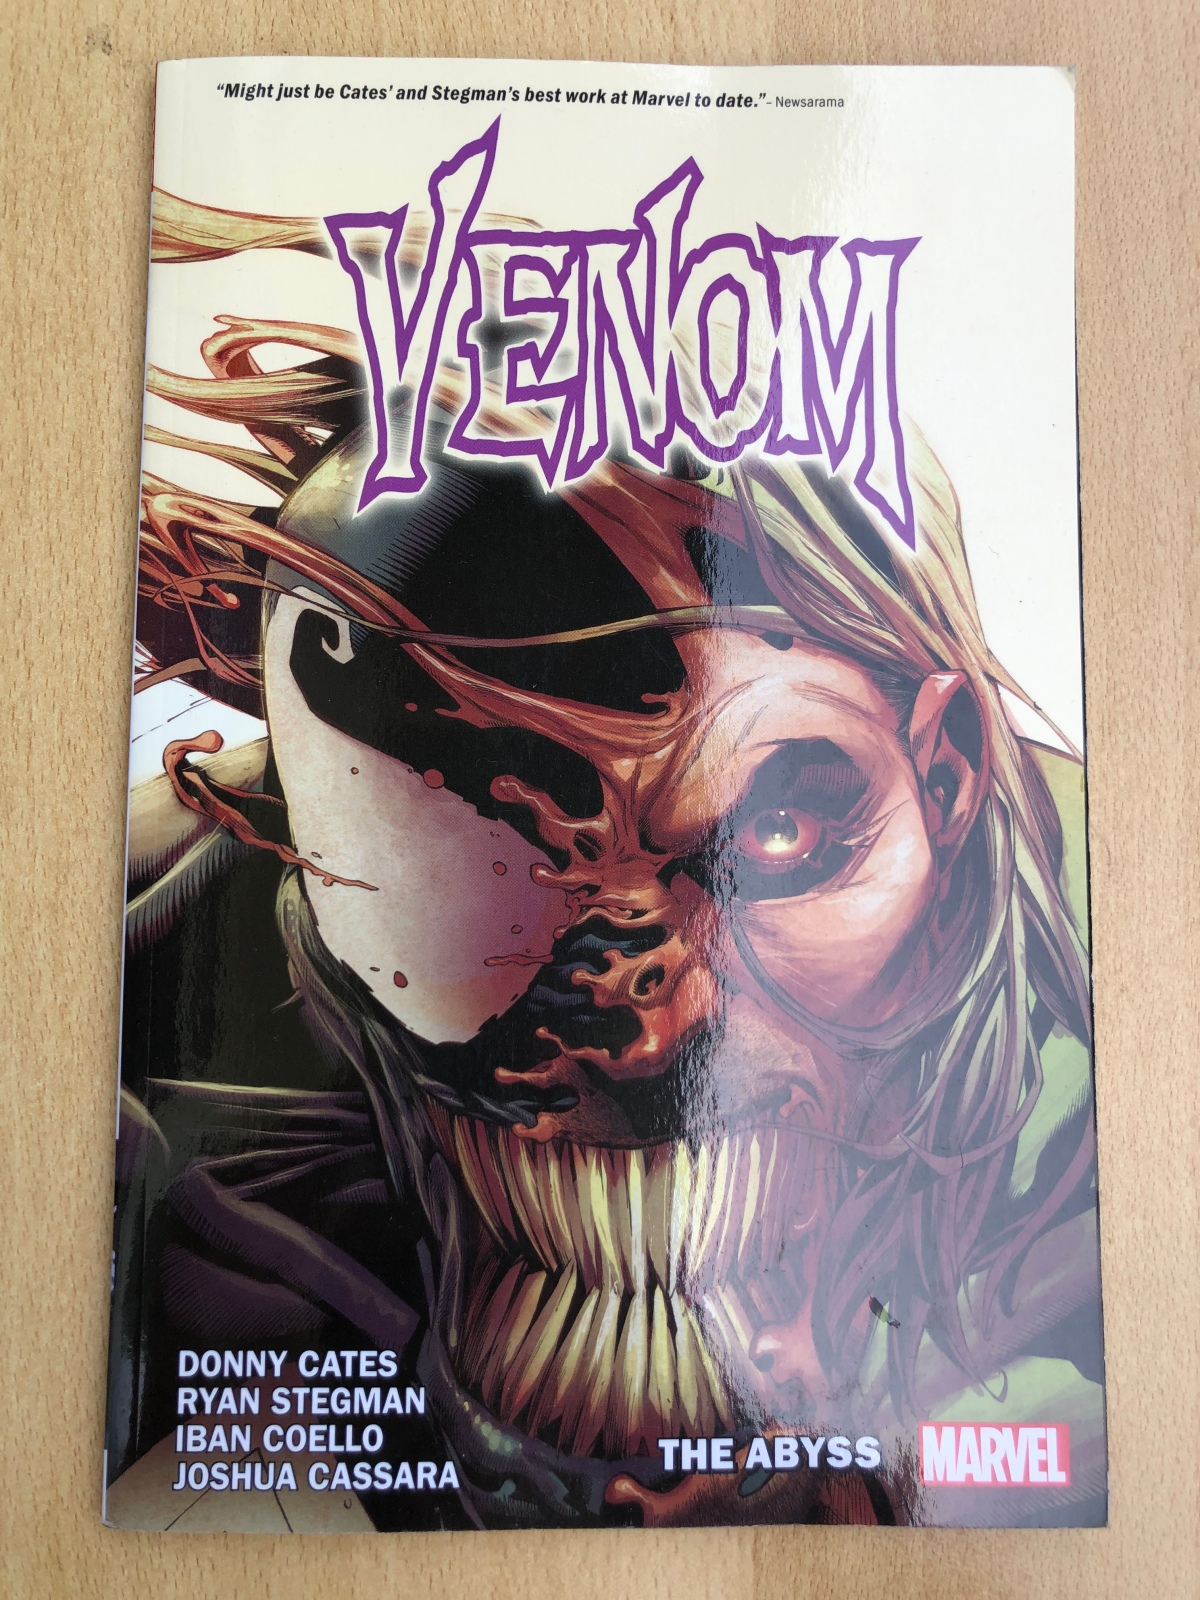 Venom Vol. 2: The Abyss |Review